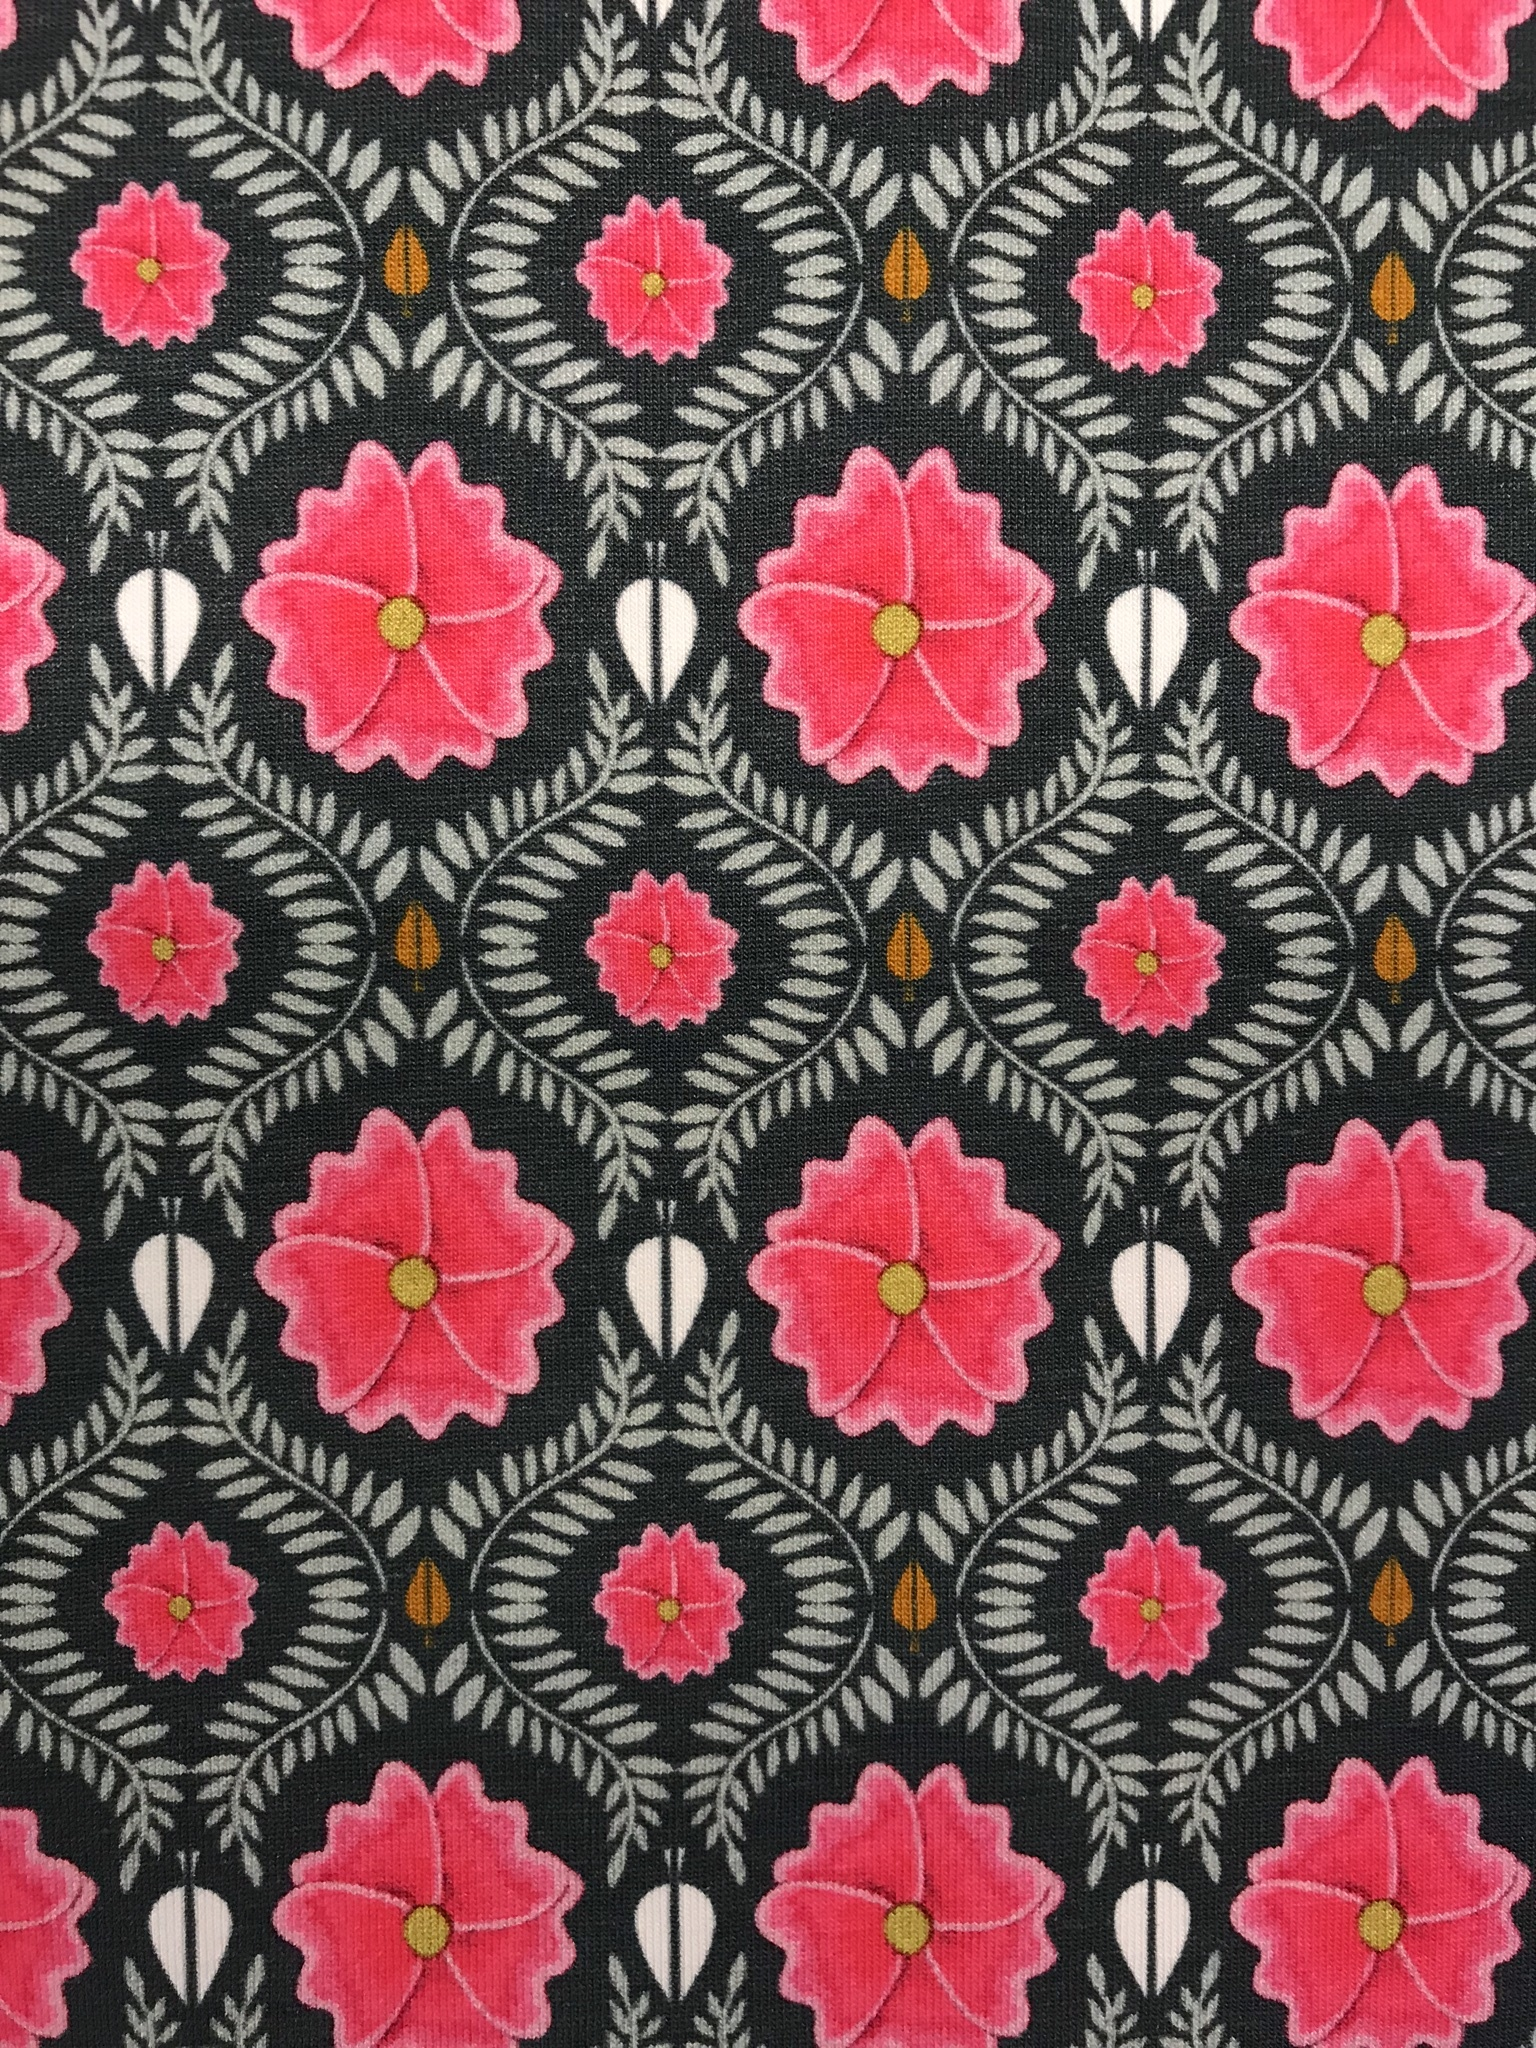 rosa blomma trikåtyg metervara cerise blå tyg